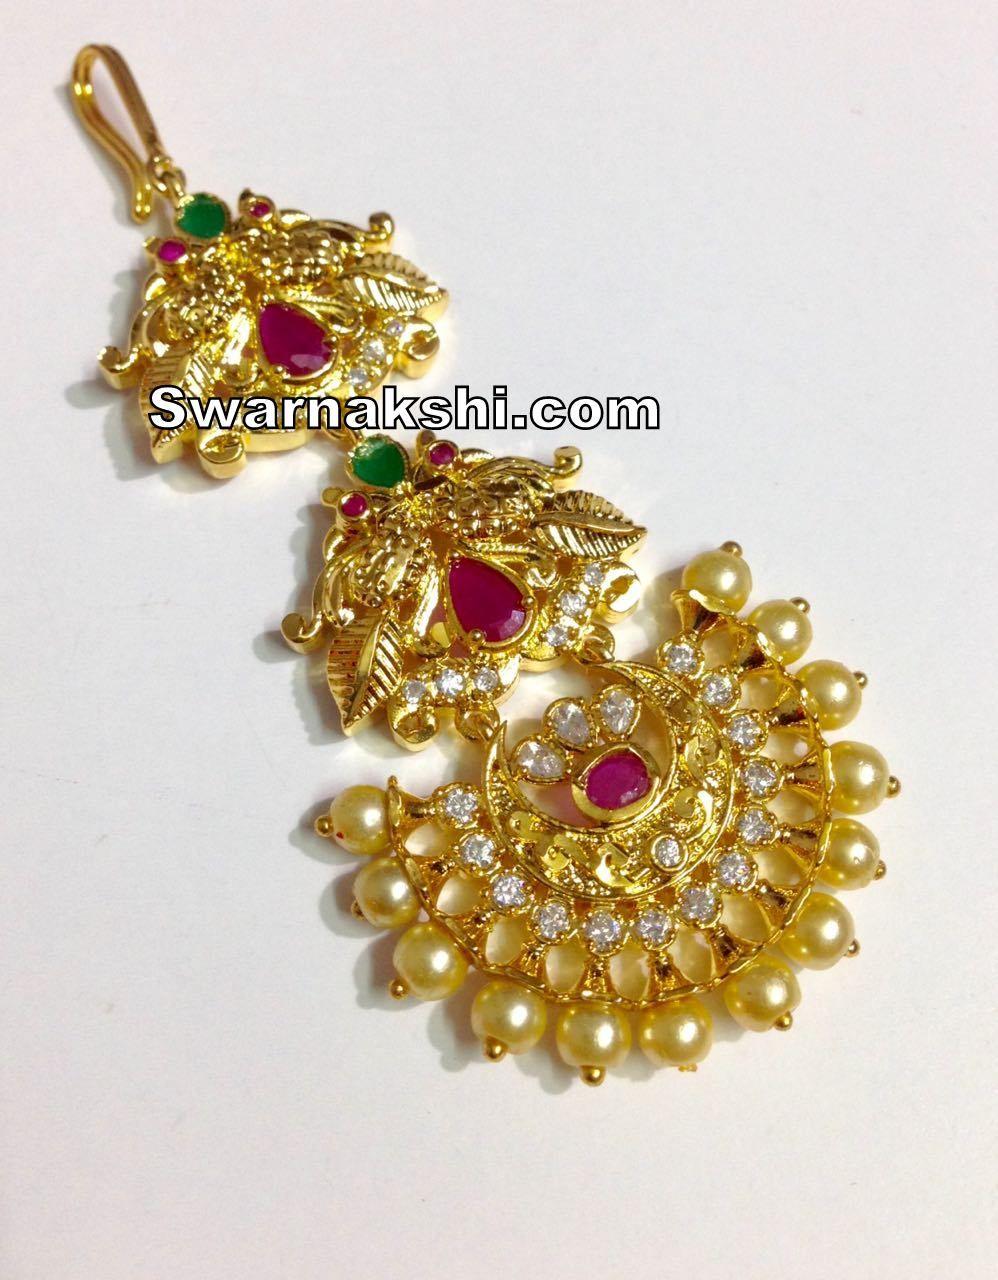 51a064b15f 1 gram gold maang tika ruby emerald floral collection #czstonejewellery  #imitationjewellery #czmaangtika #